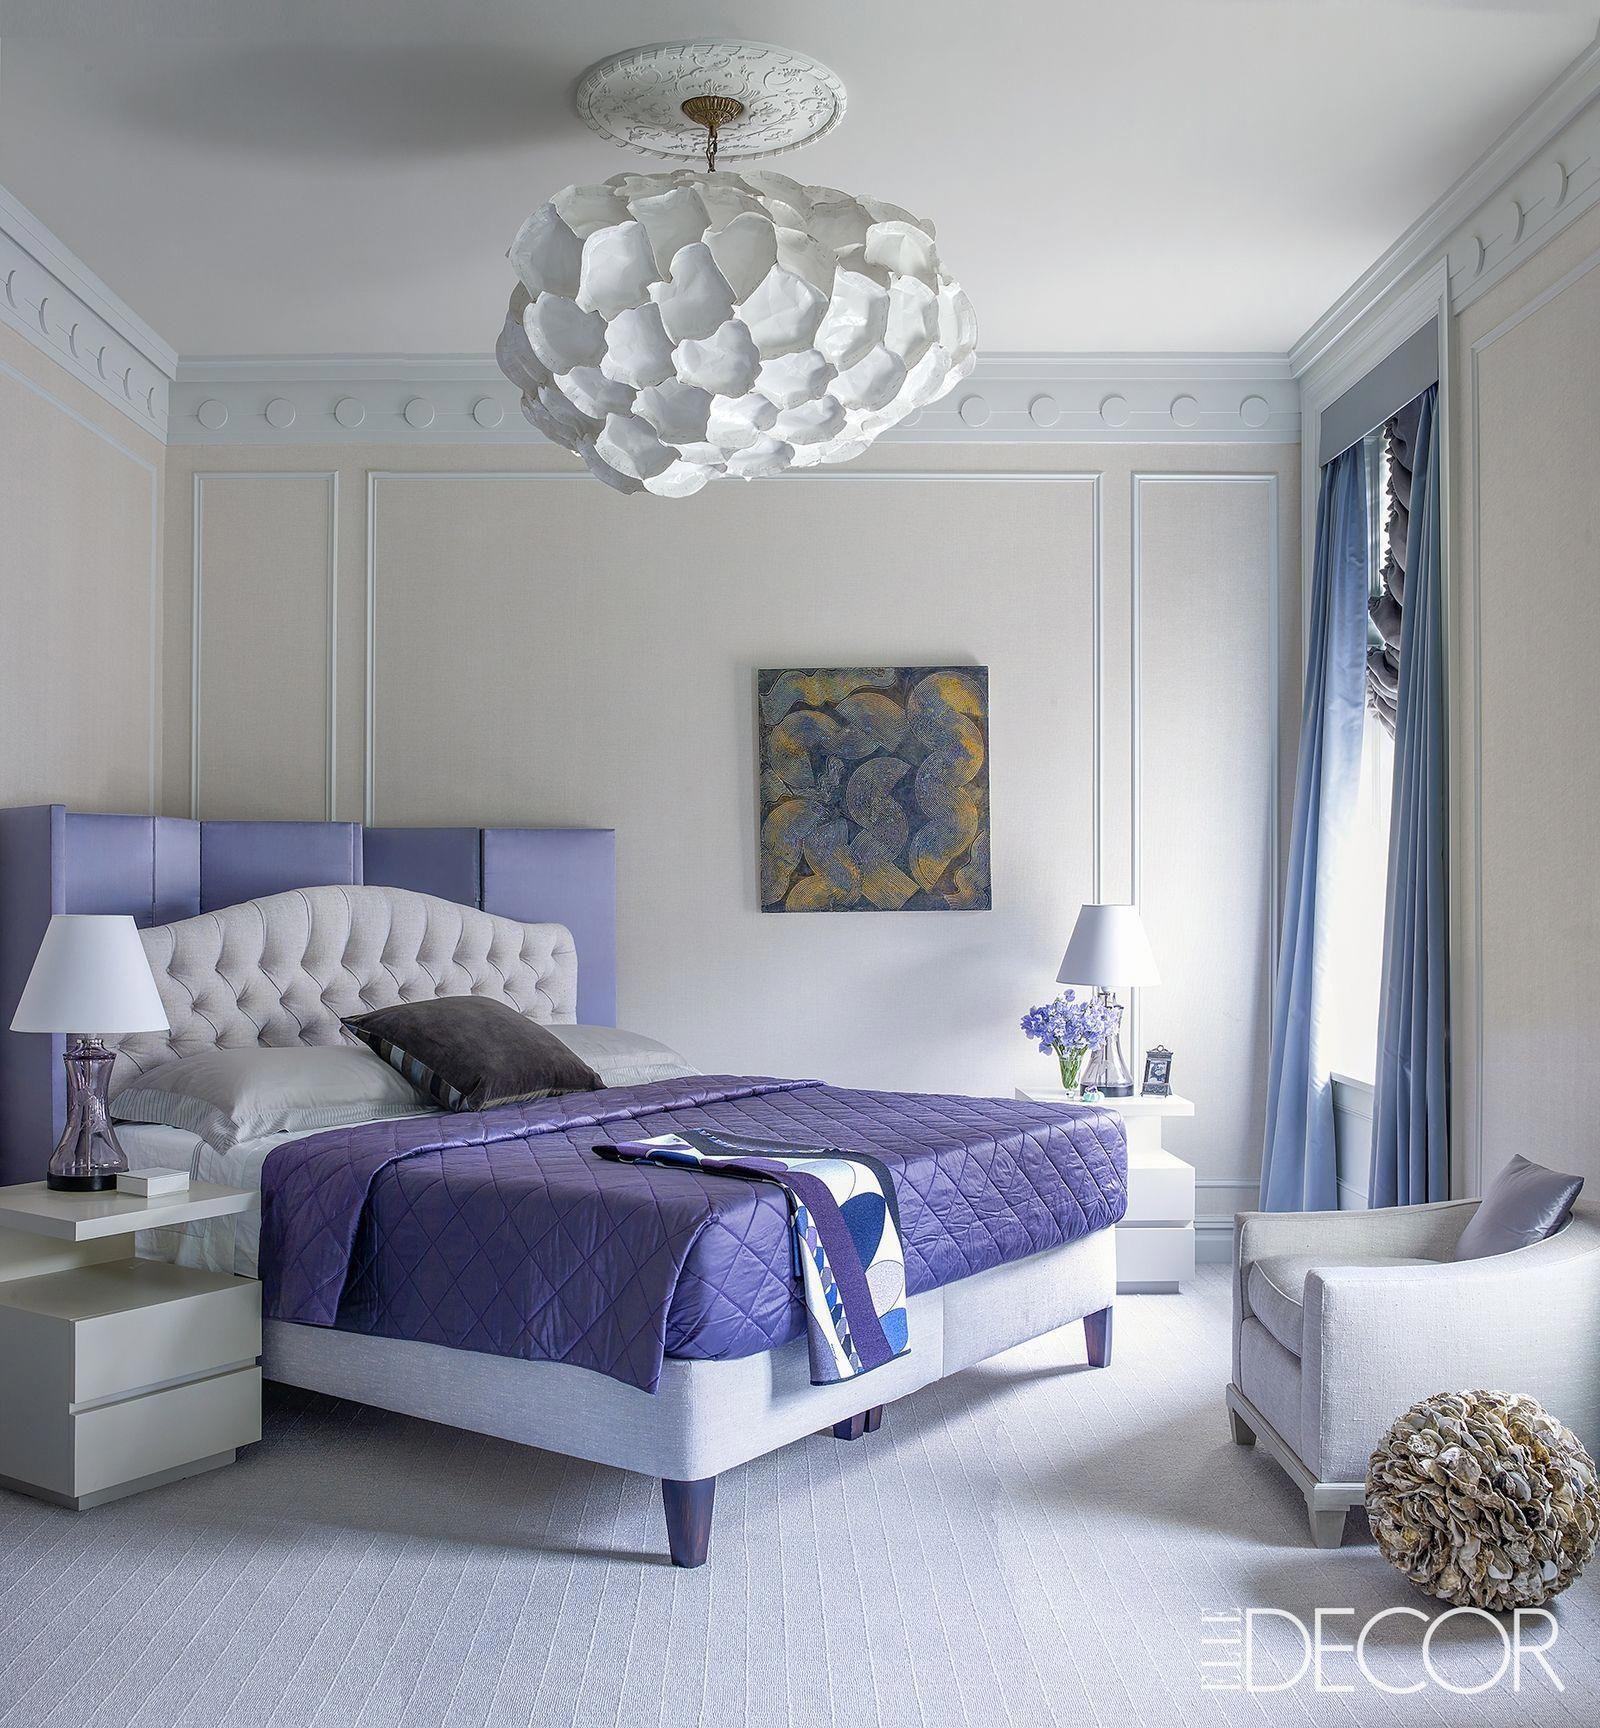 Love The Rich Purple Tones And The Giant Paper Pendant Lighting Fixture In The Interior Design For Thi Bedroom Interior Elegant Bedroom Modern Bedroom Lighting